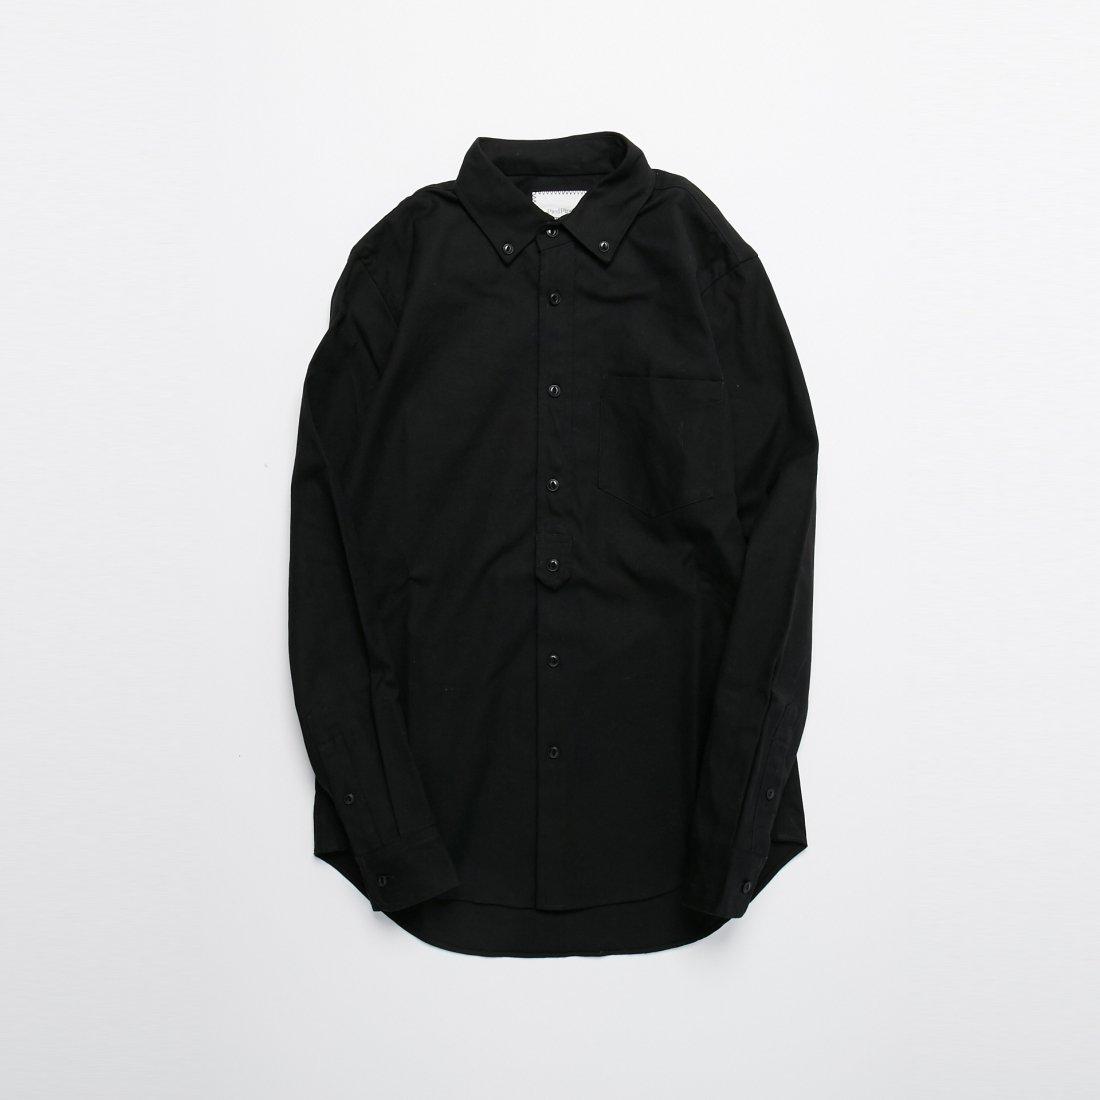 【PIED PIPER REBIRTH PROJECT】キャンバスボタンダウンシャツ BLK